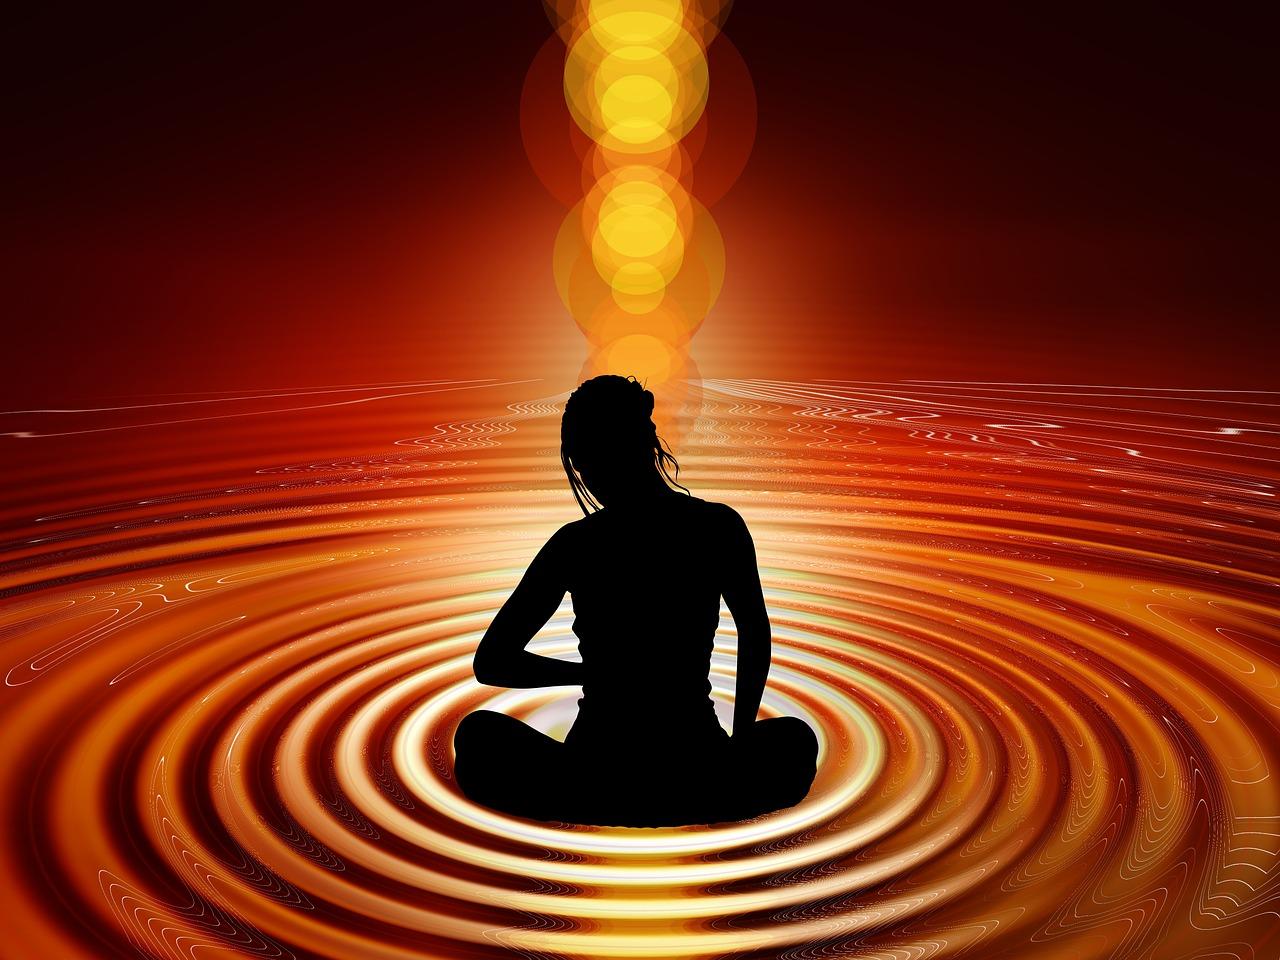 selbstheilung-aktivieren-krankheiten-heilen-durch-bewusstwerdung